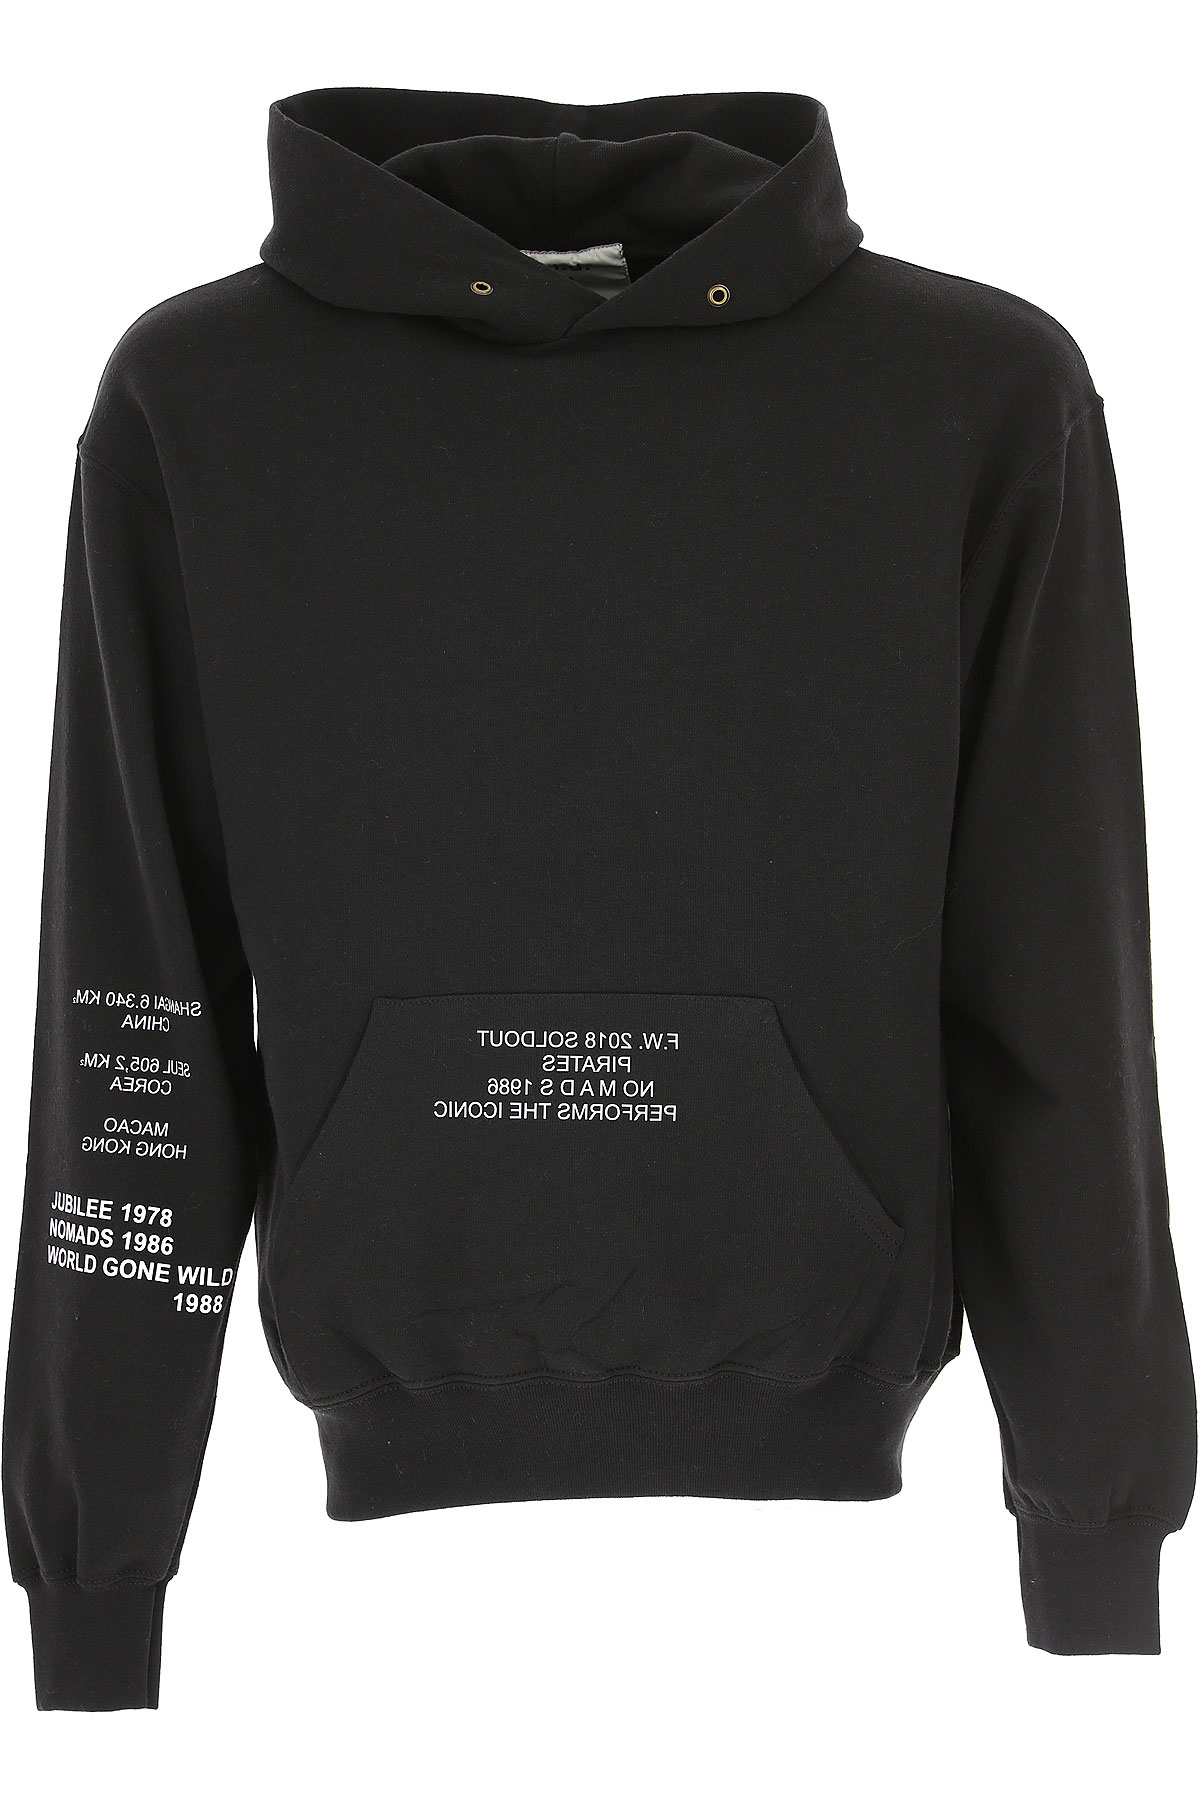 Image of Sold Out FRVR Sweatshirt for Men, Black, Cotton, 2017, M S XL